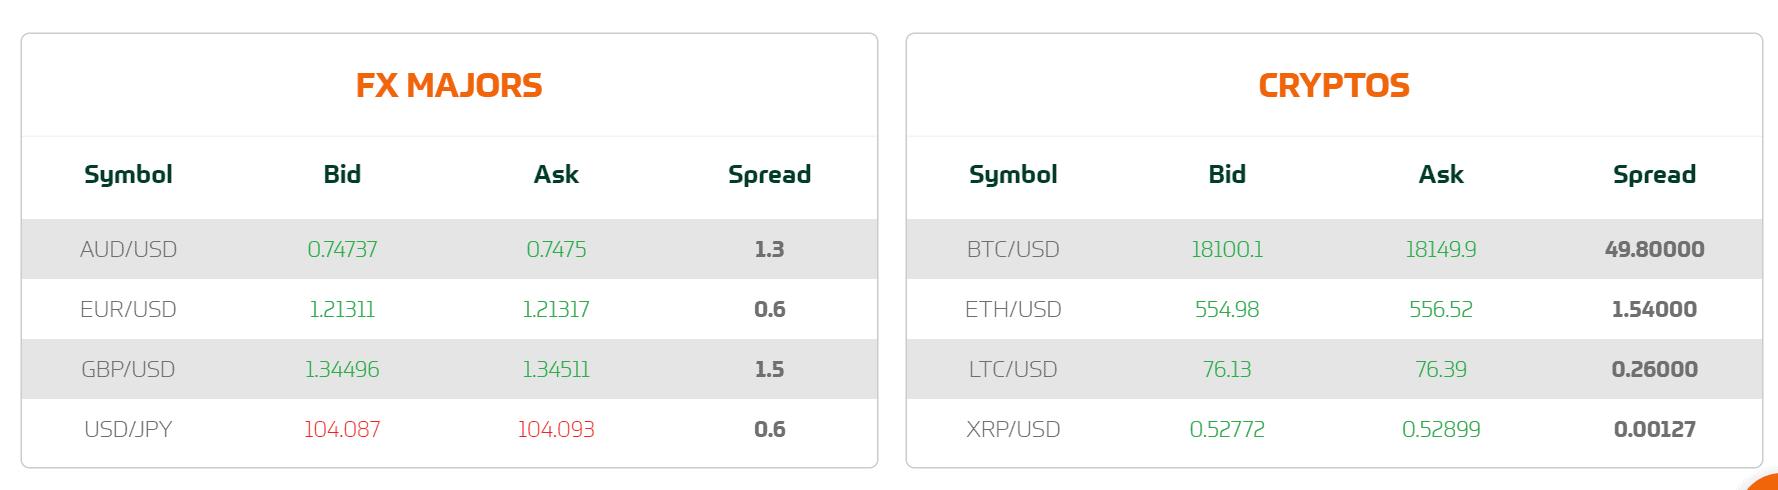 cedarfx spreads